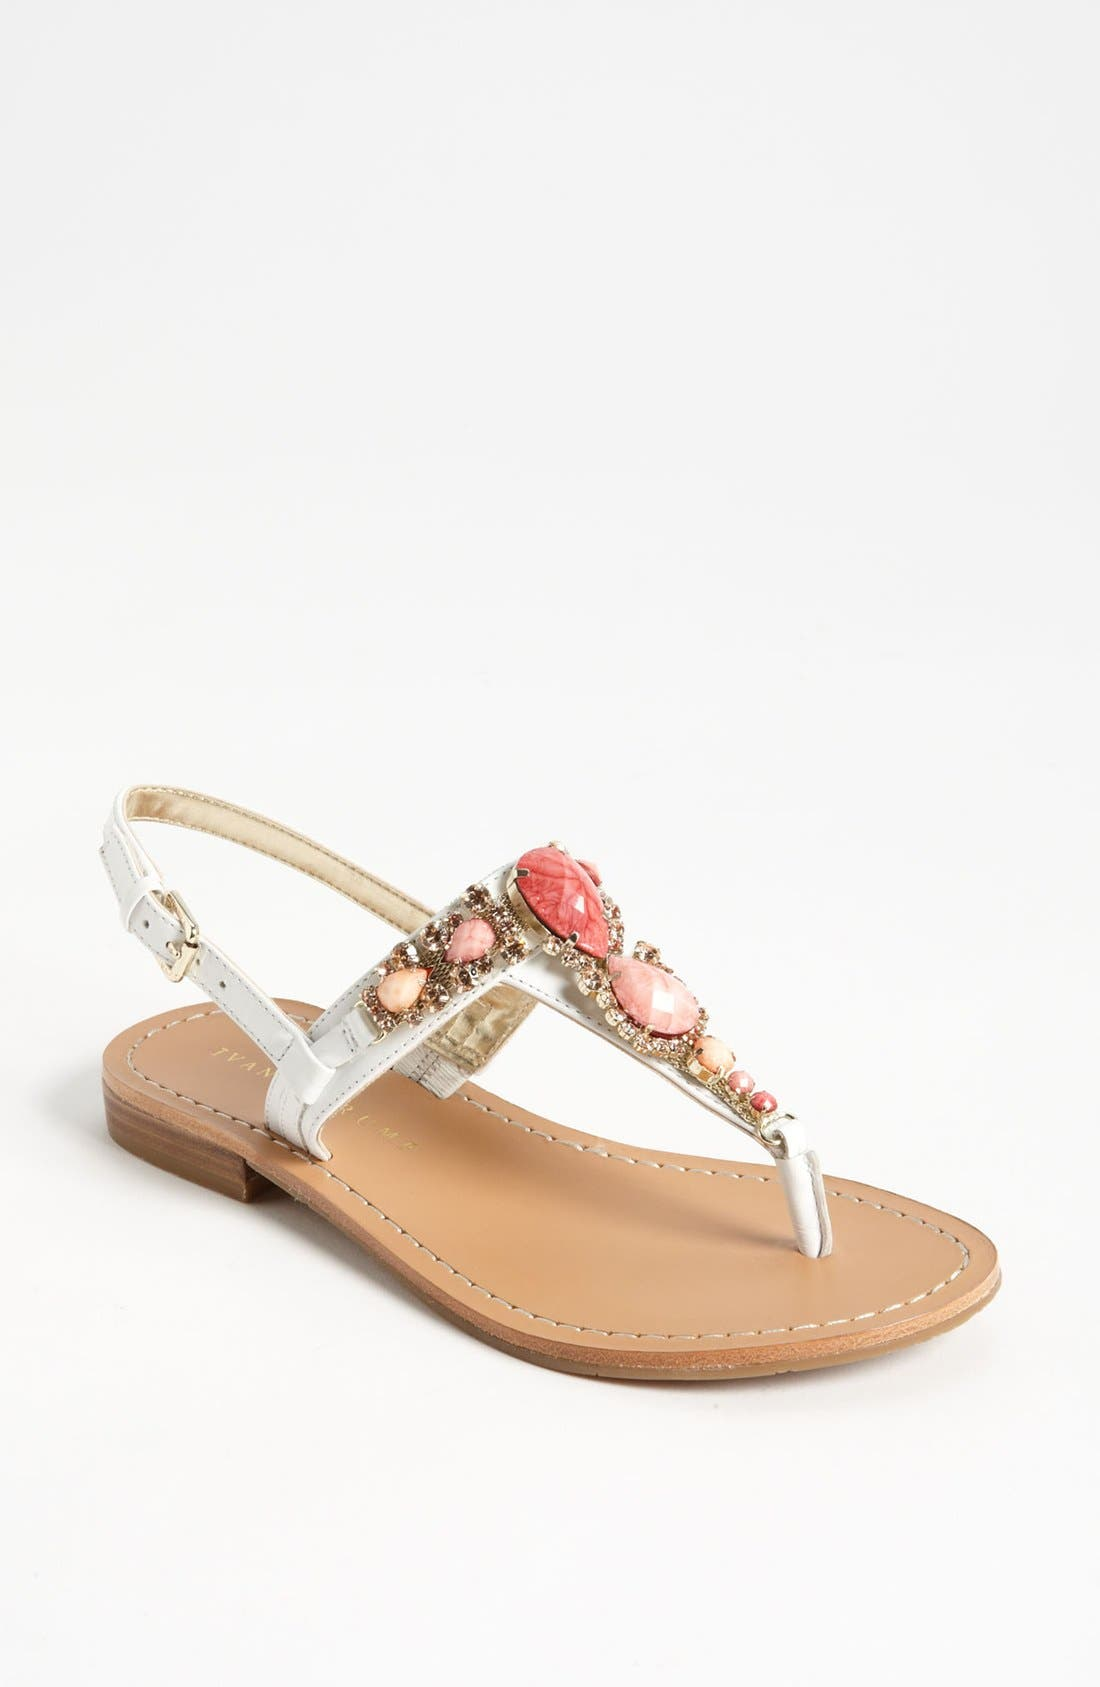 Main Image - Ivanka Trump 'Pansy' Sandal